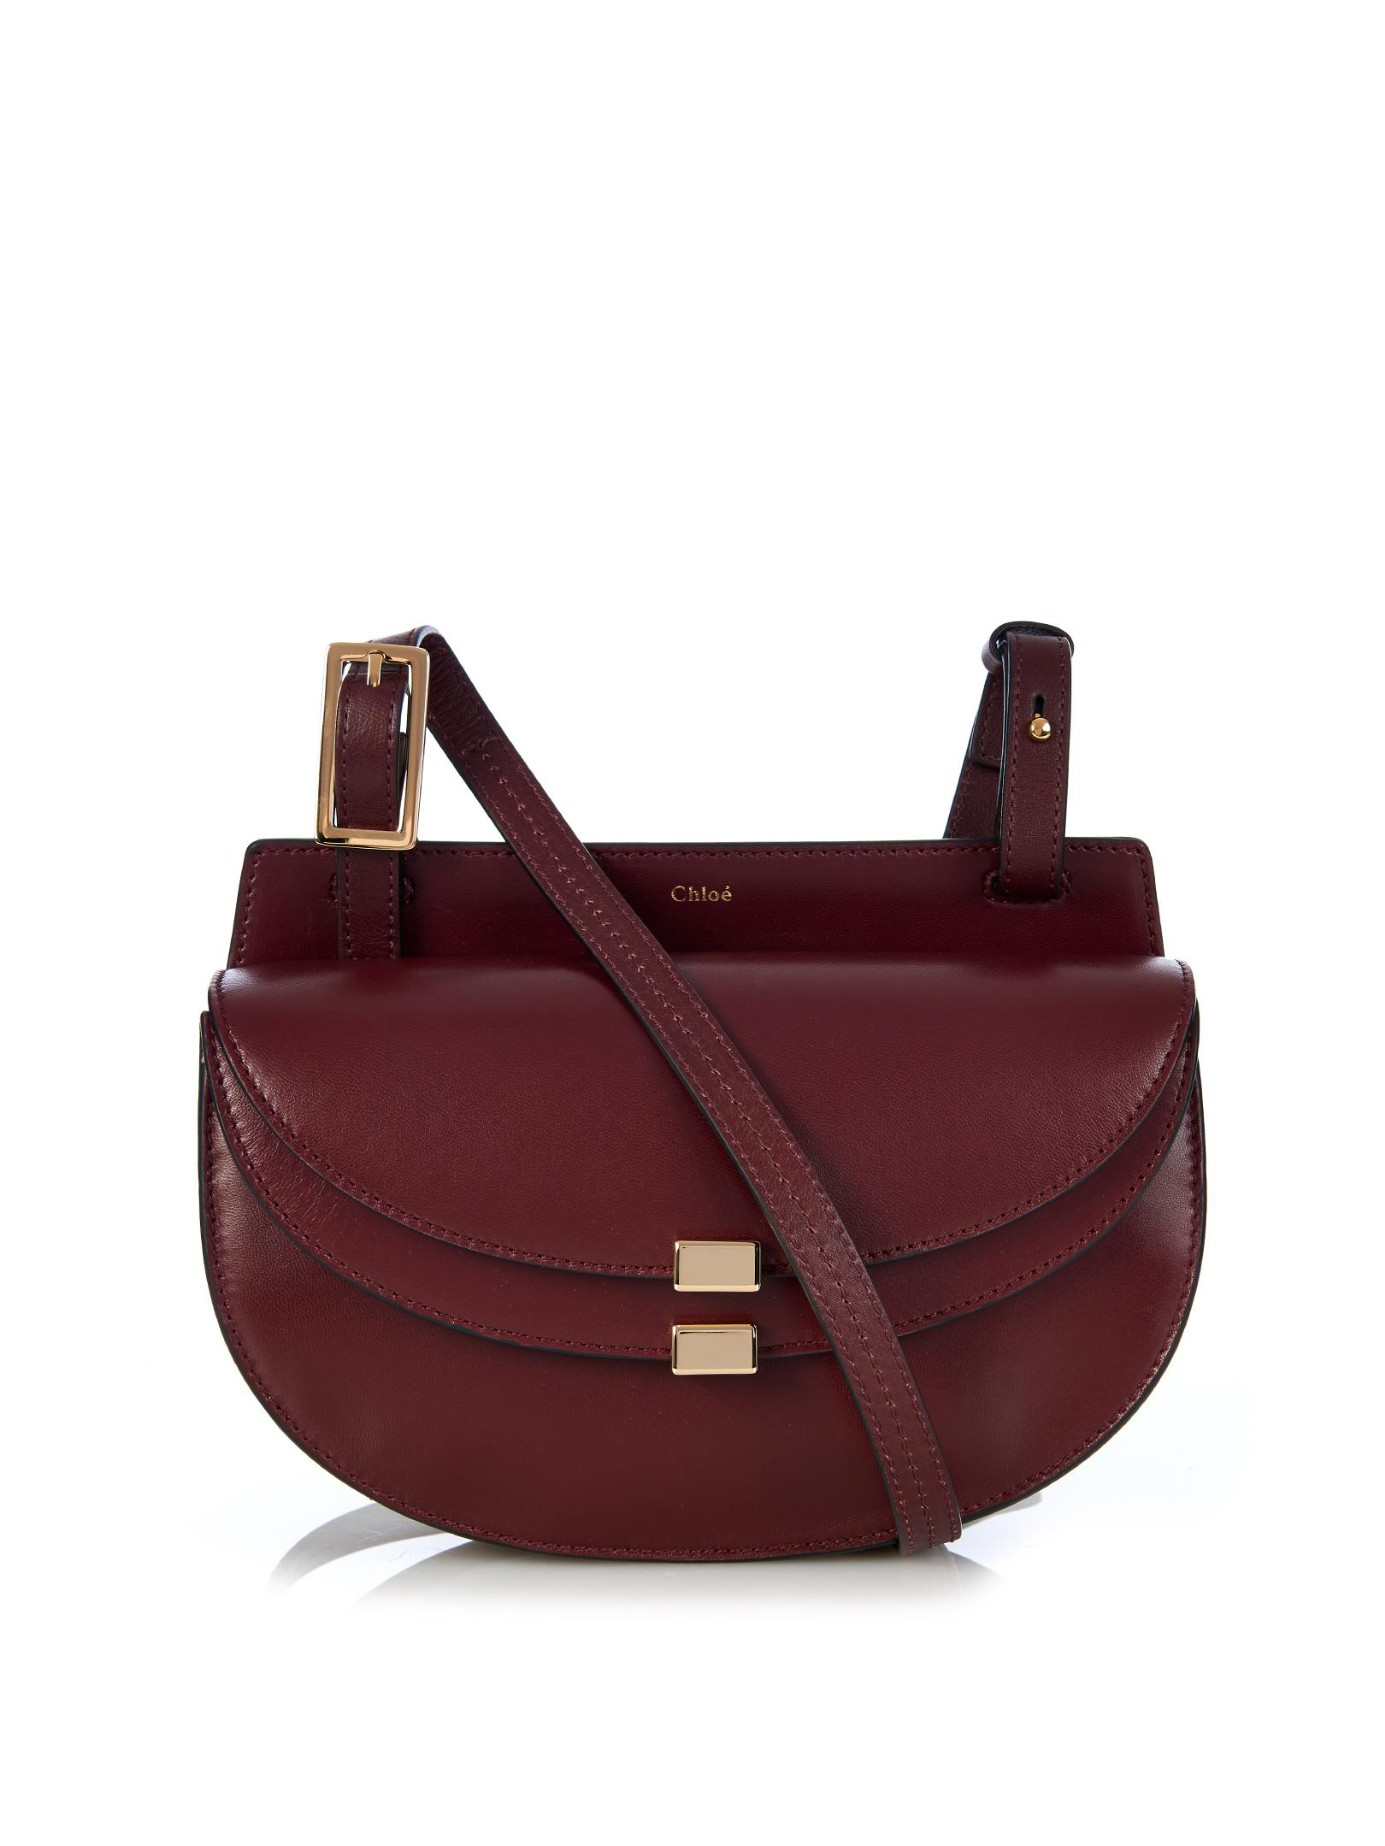 Lyst - Chloé Georgia Mini Leather Cross-Body Bag in Purple 90b0e76387